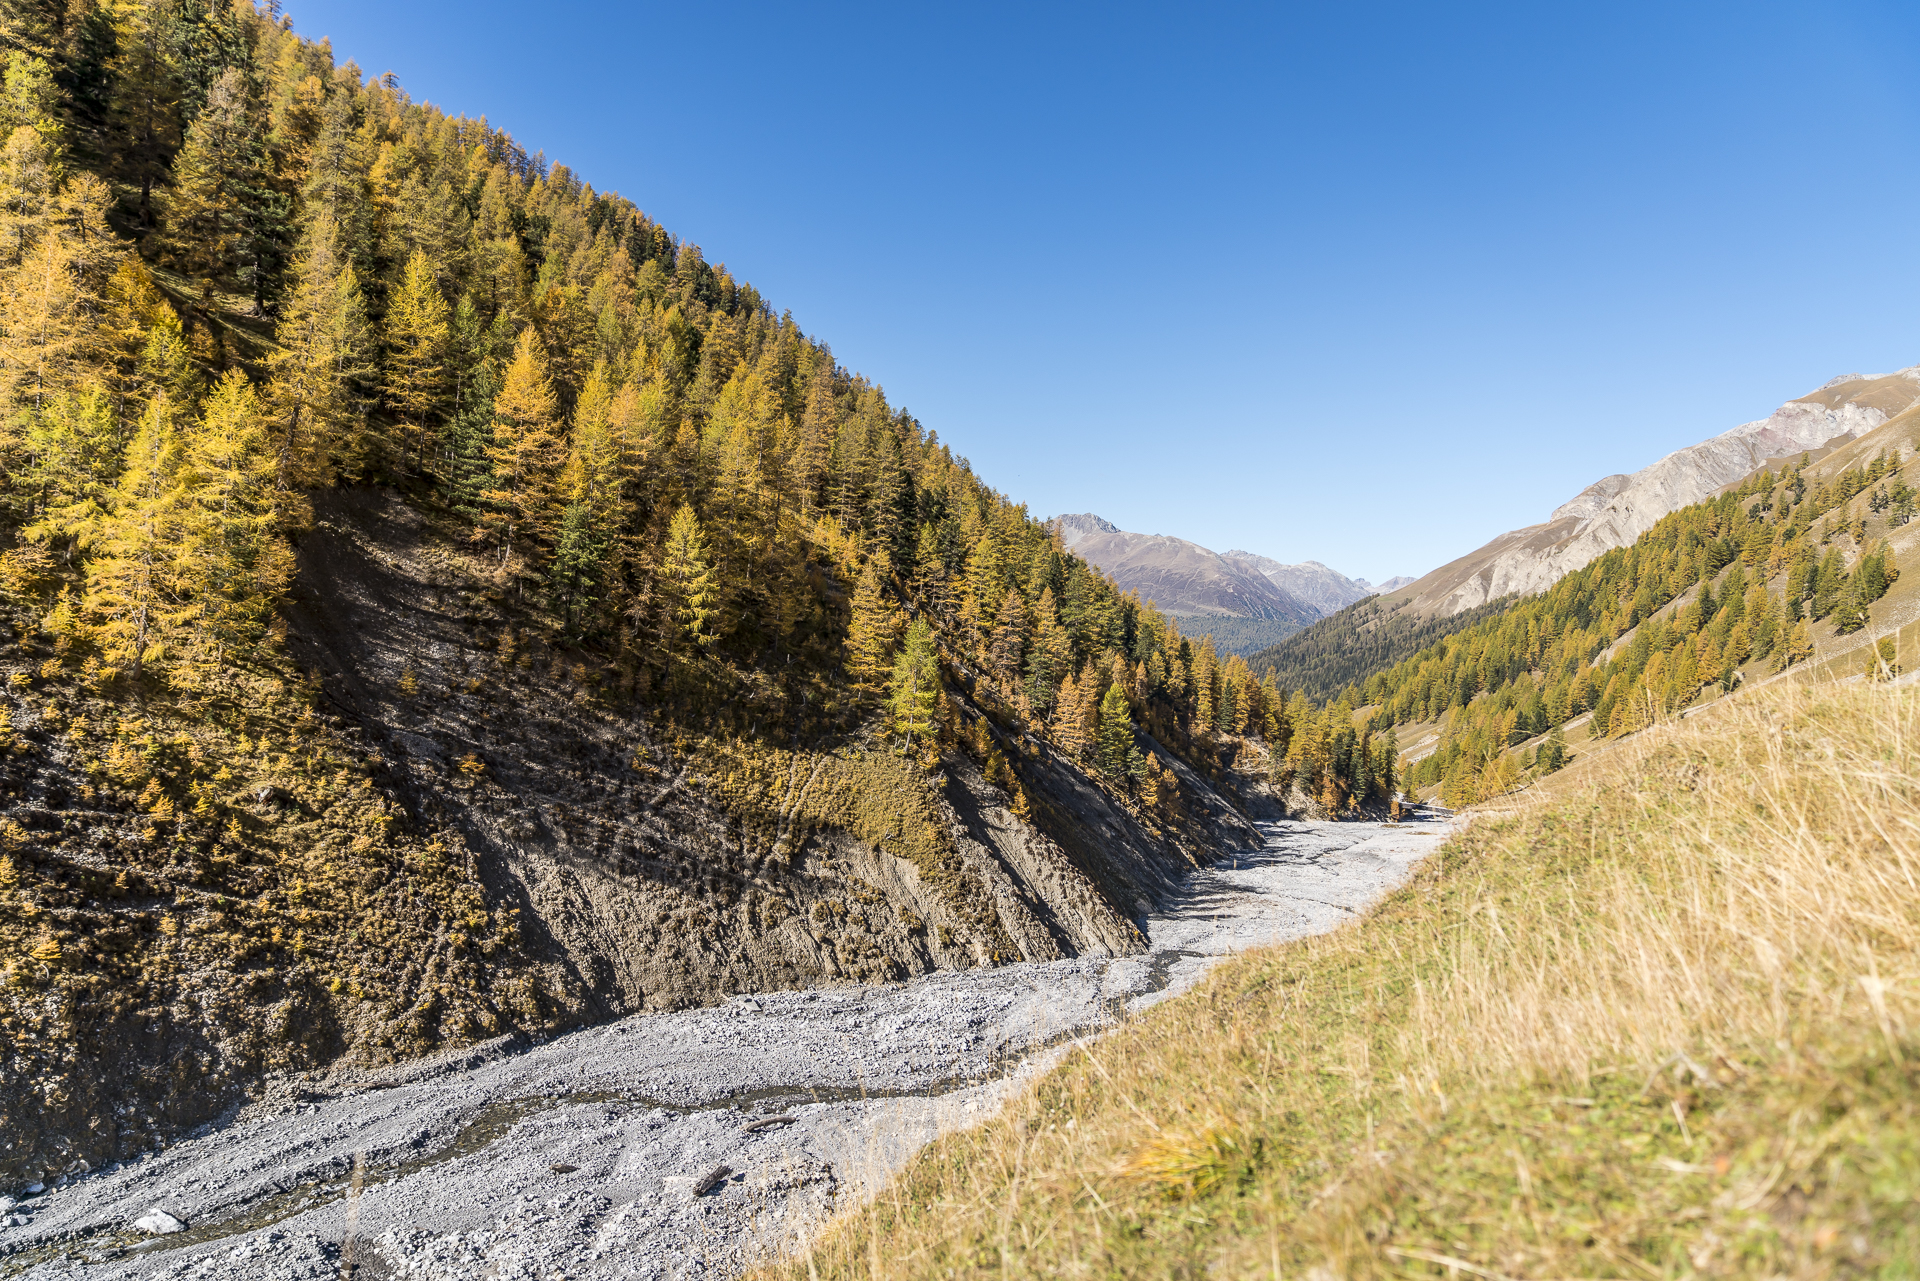 Alp Trupchun Fluss